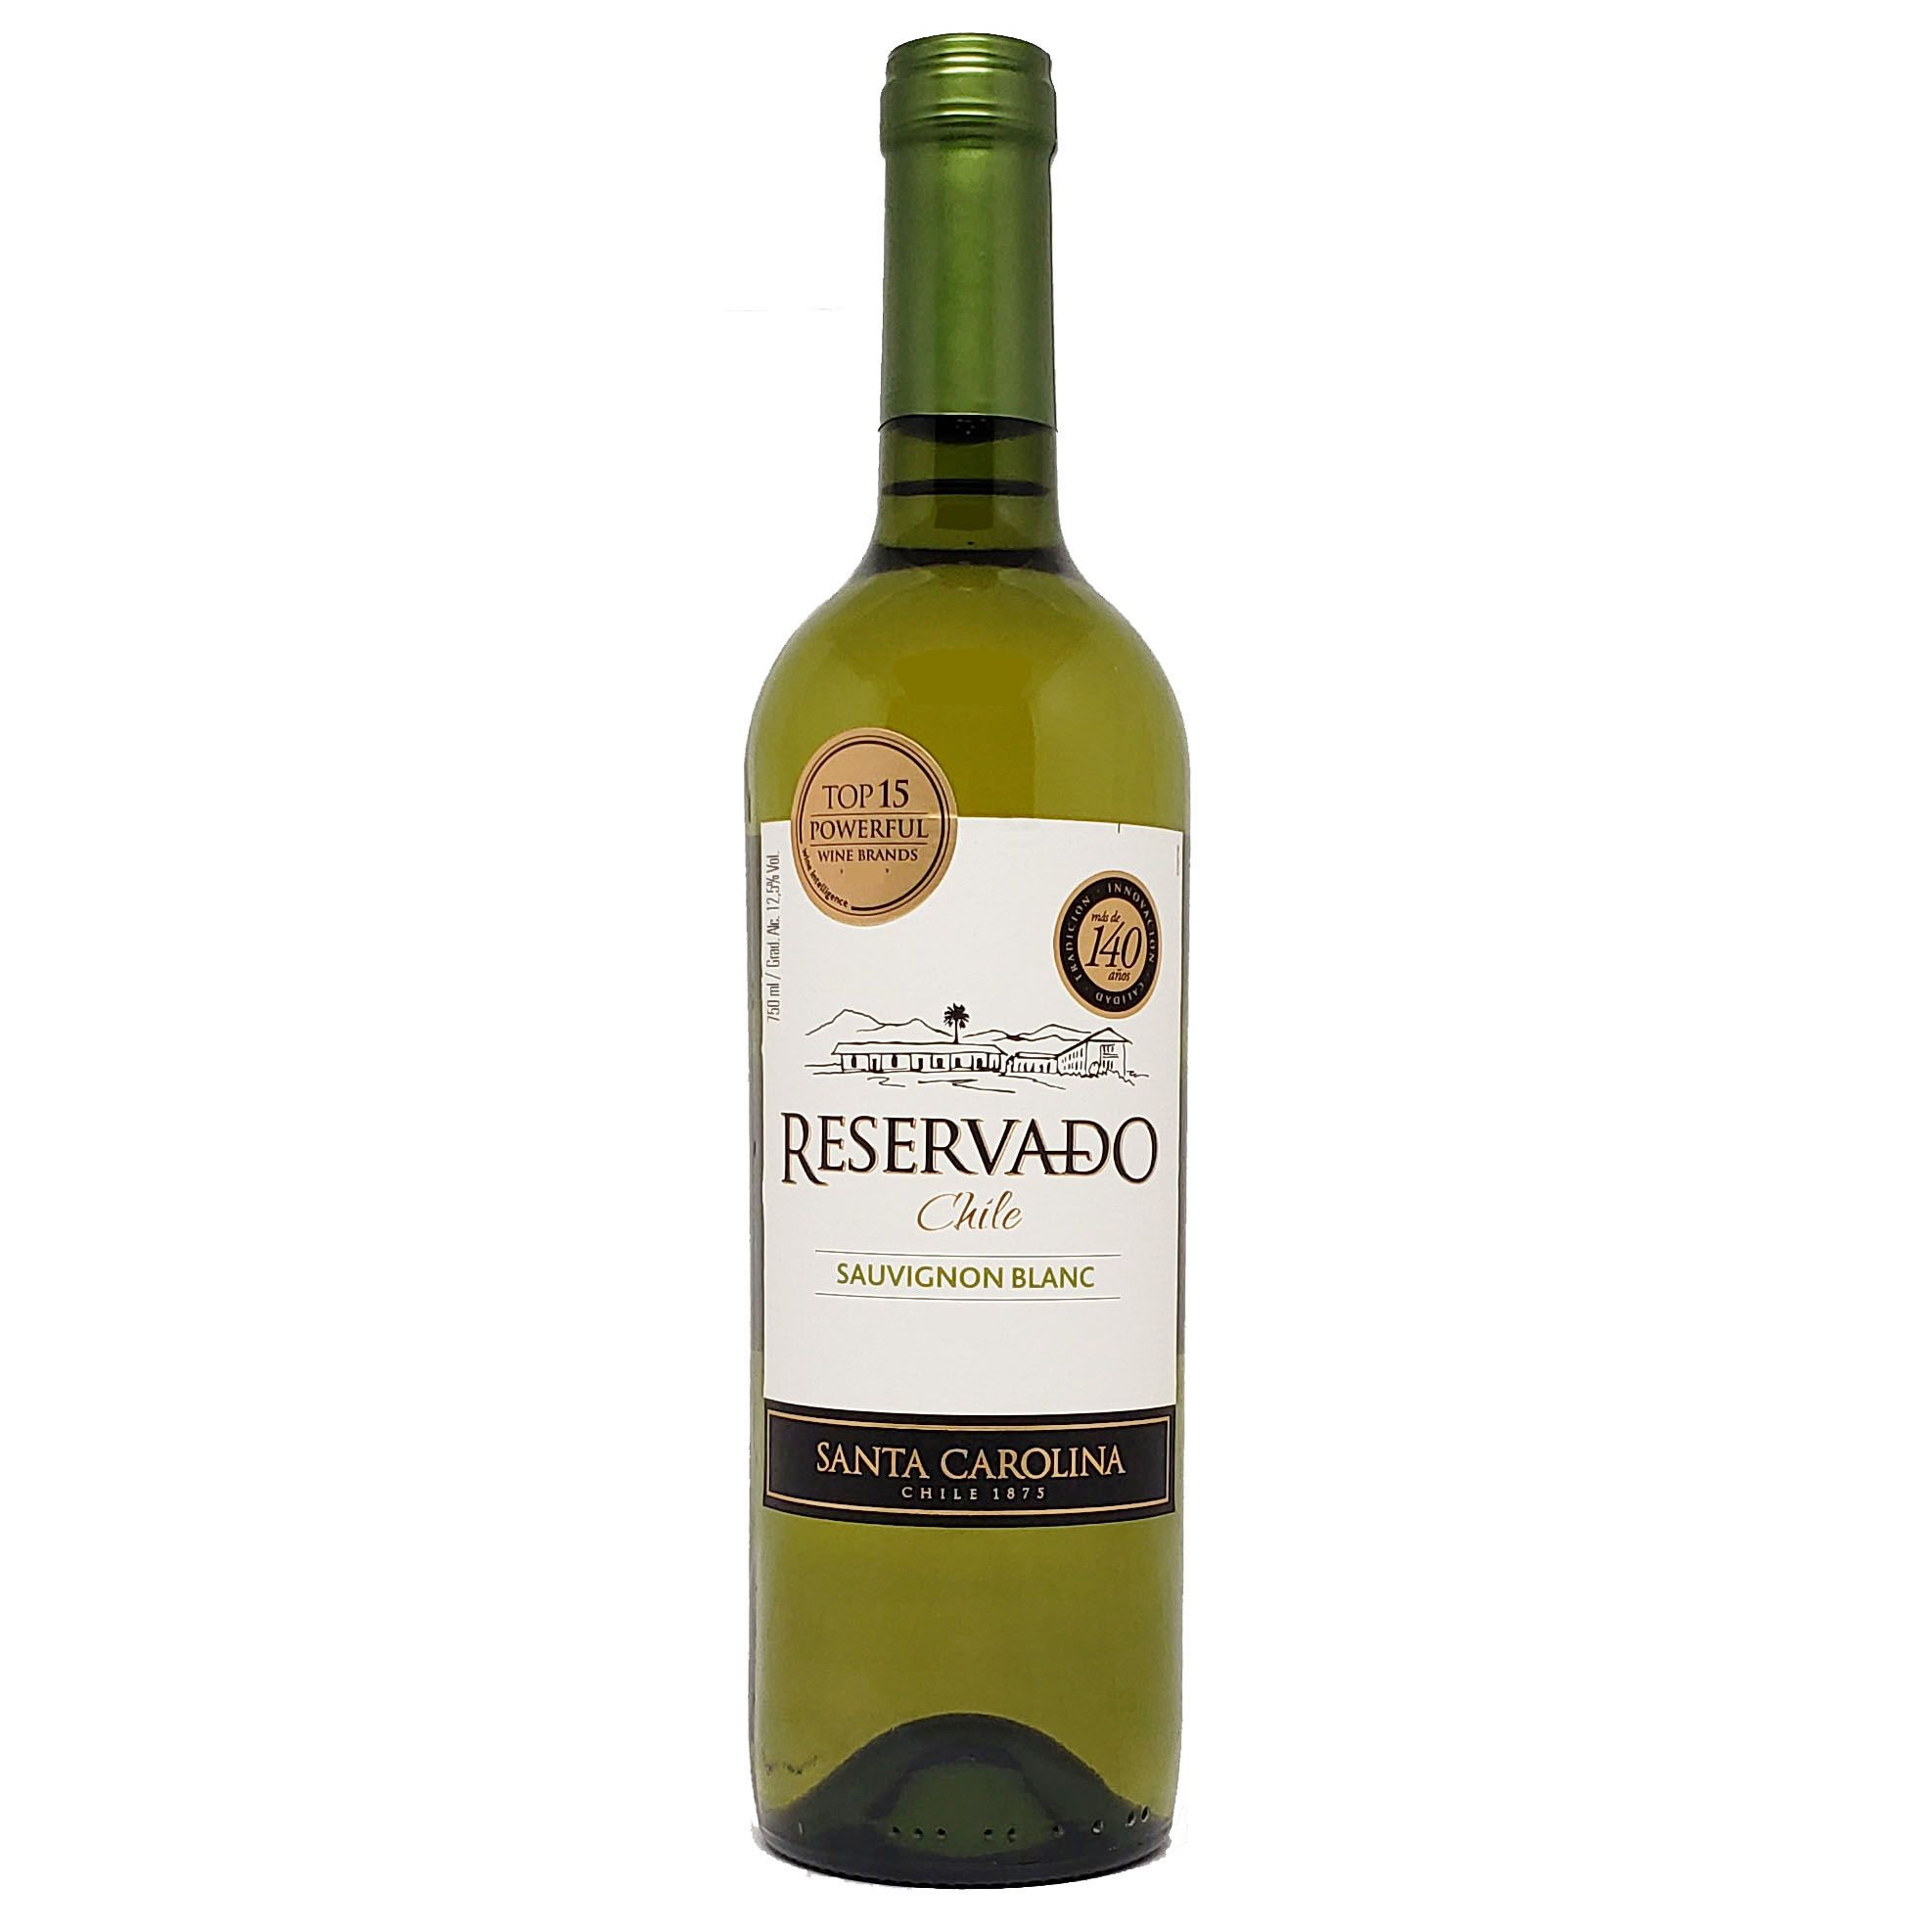 Vinho Santa Carolina Reservado Sauvignon Blanc Chile - 750ml -